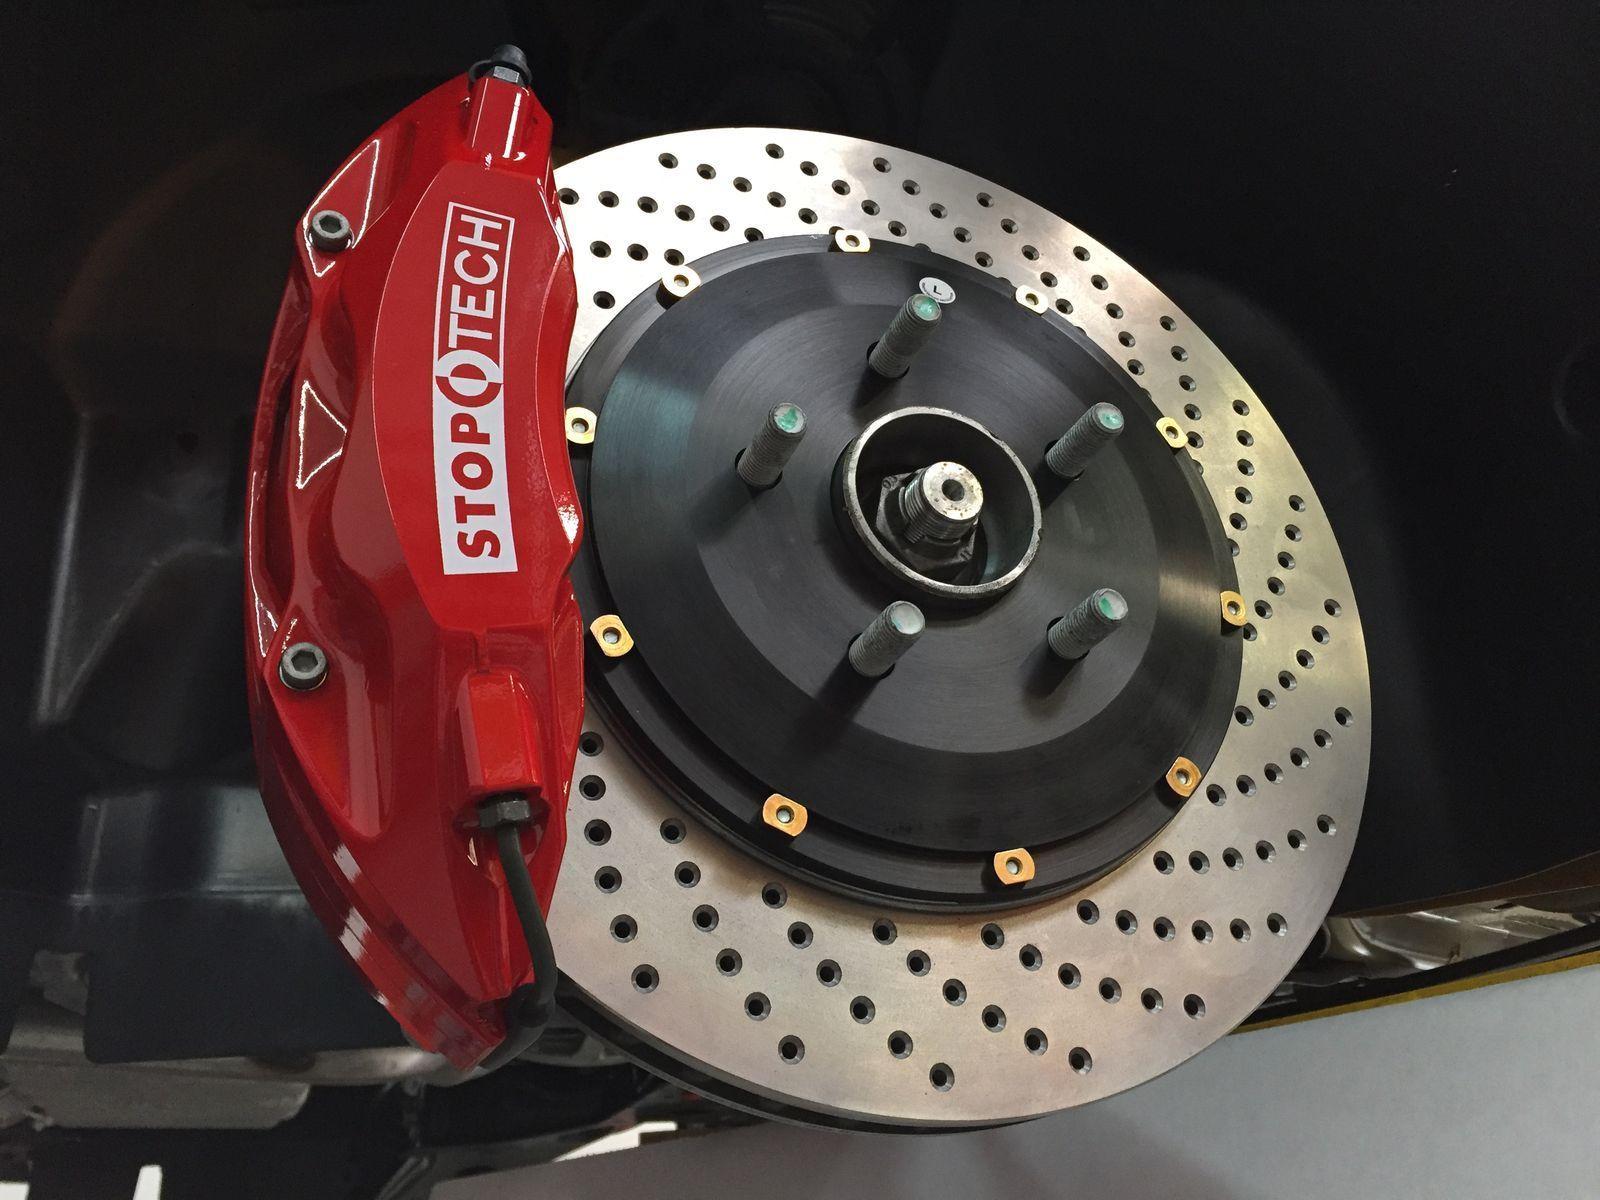 2015 Ford Focus ST | 2015 Focus ST by FSWerks - Brake System